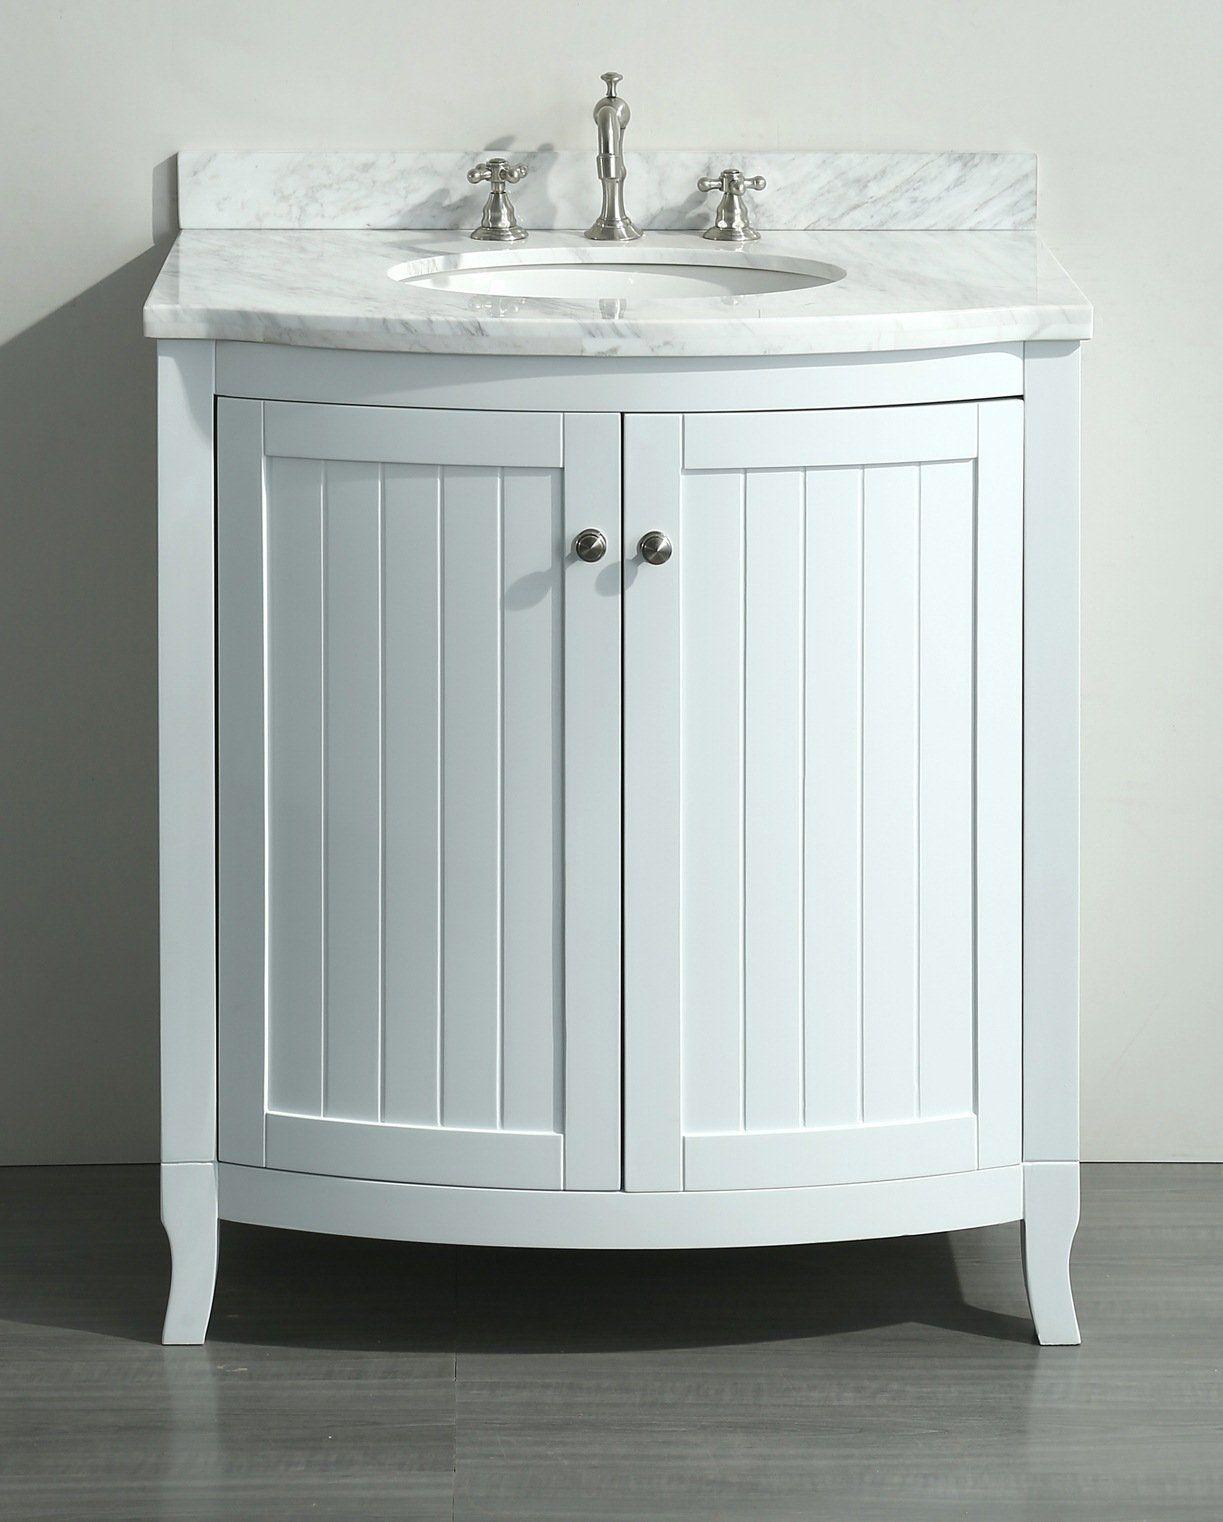 White 30 Inch Bathroom Vanity White Carrera Marble Top Single